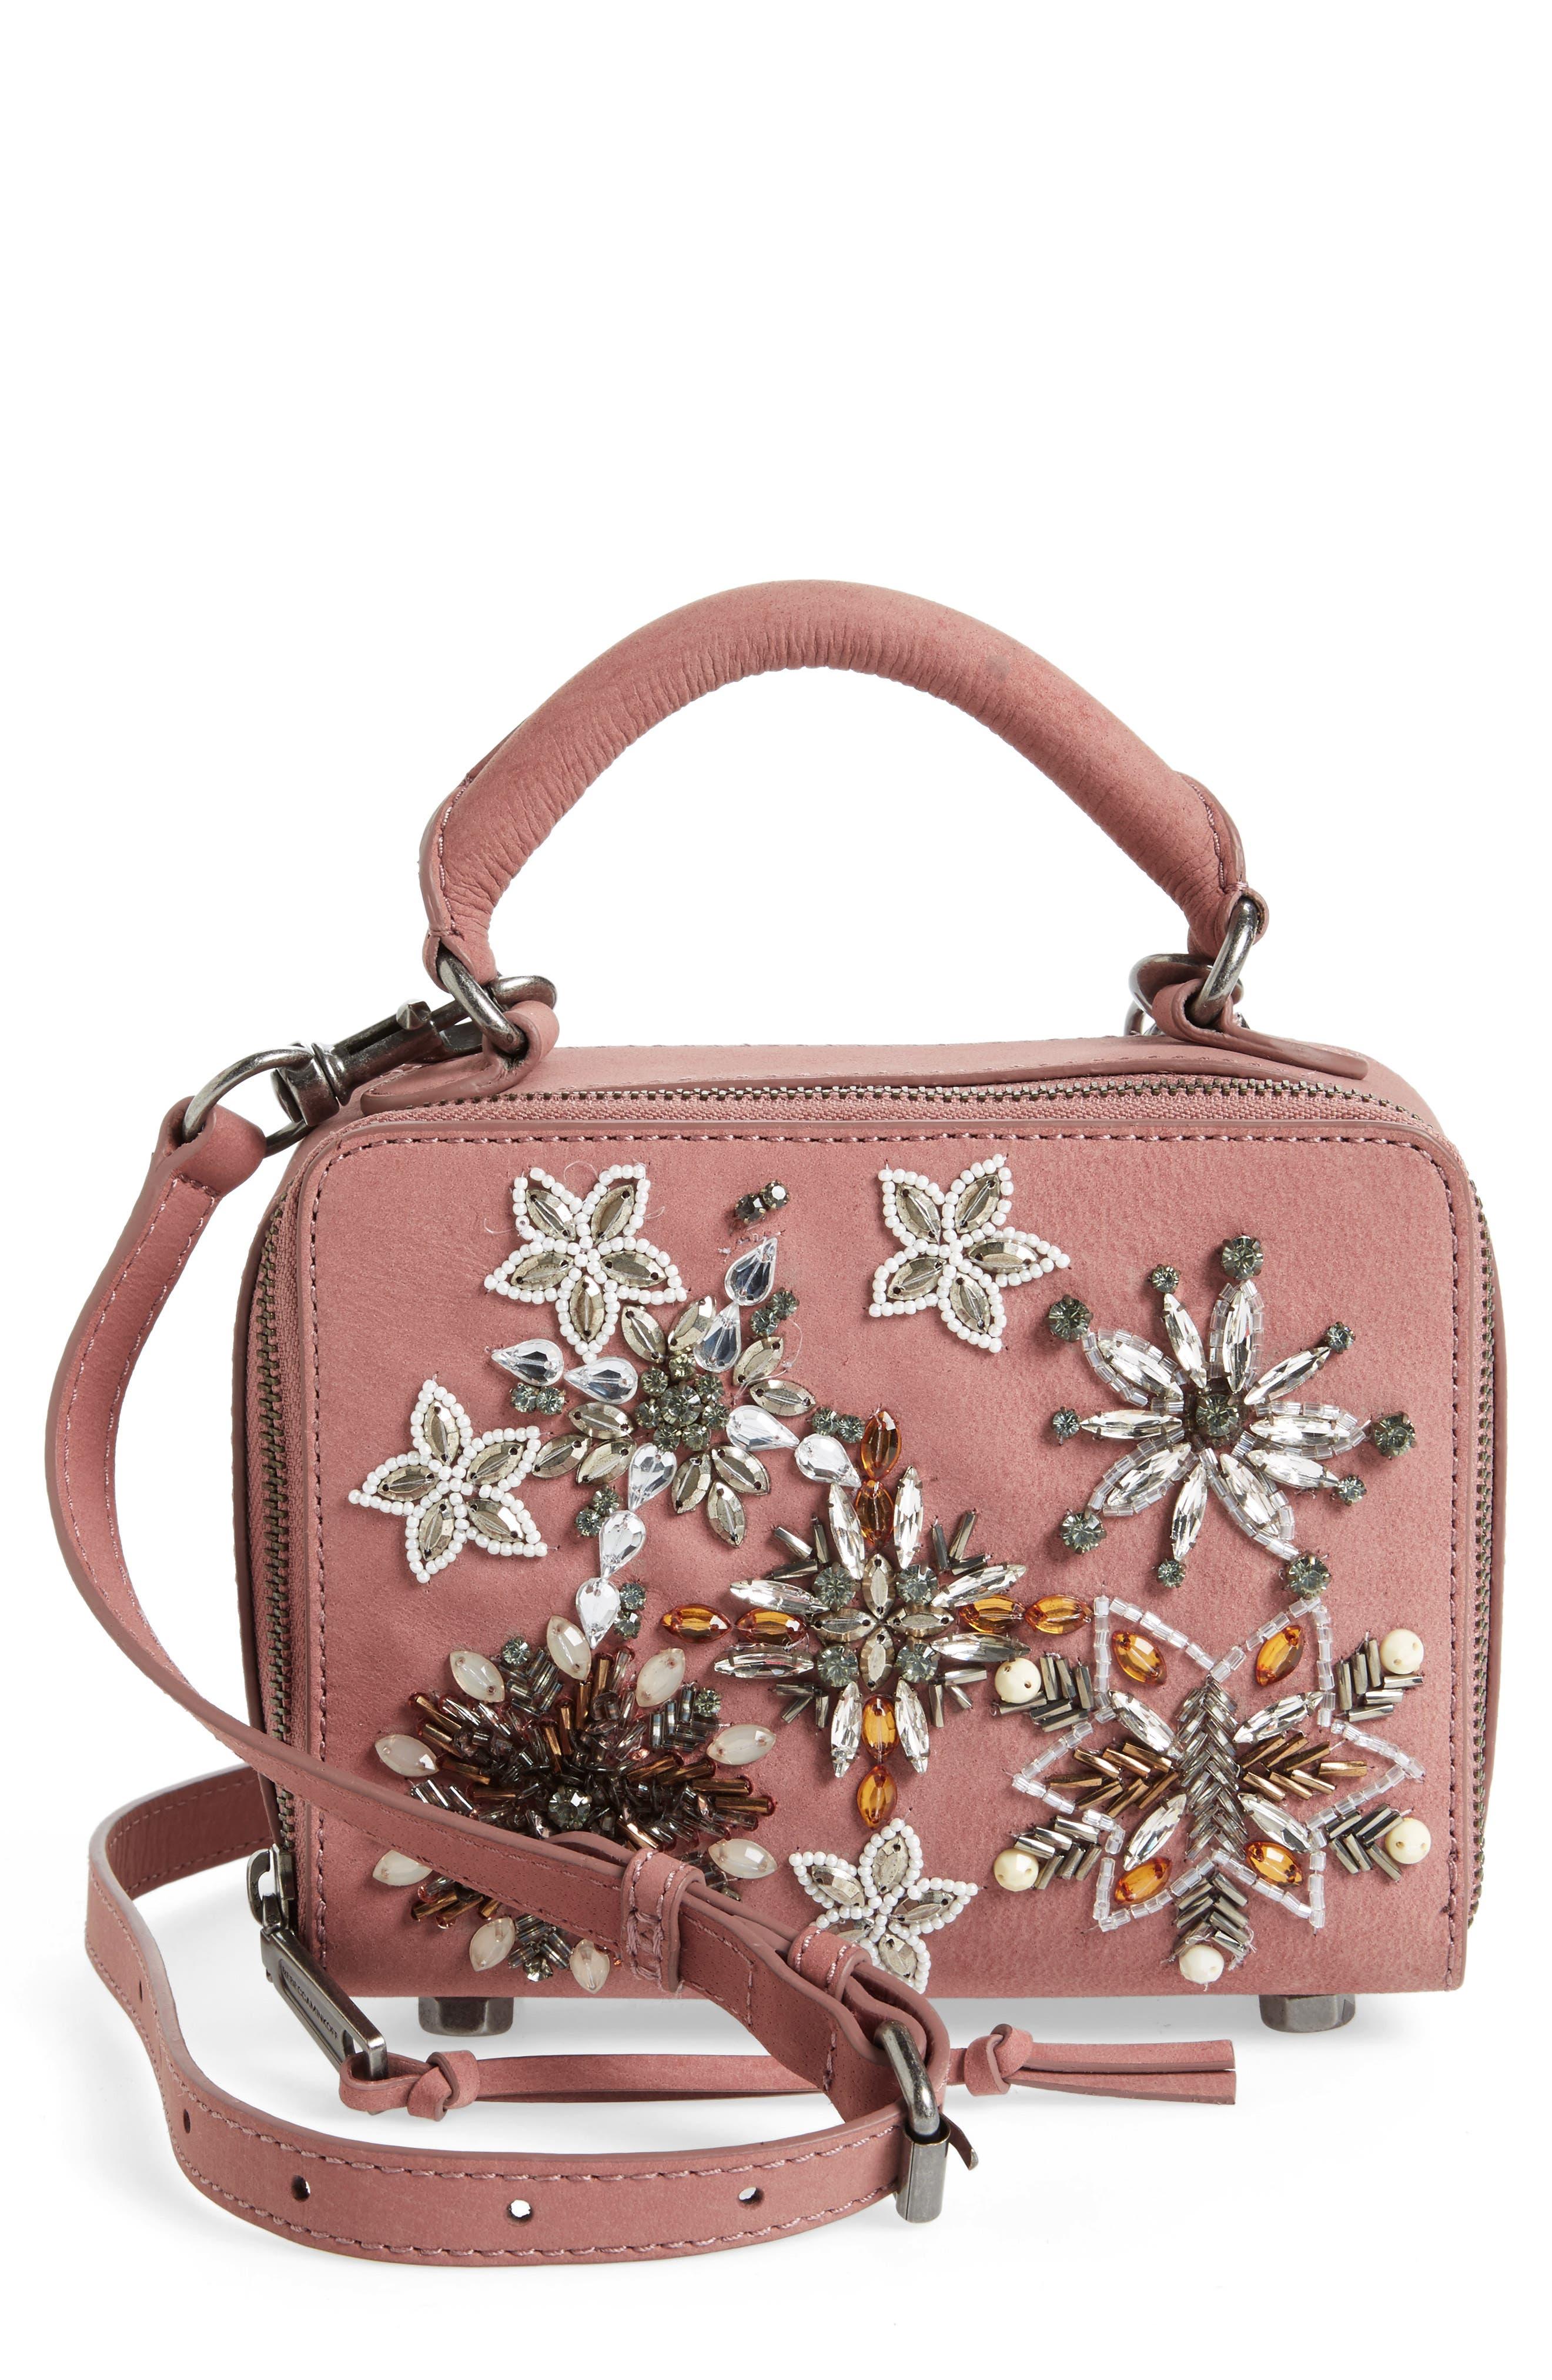 Rebecca Minkoff Embellished Box Leather Crossbody Bag